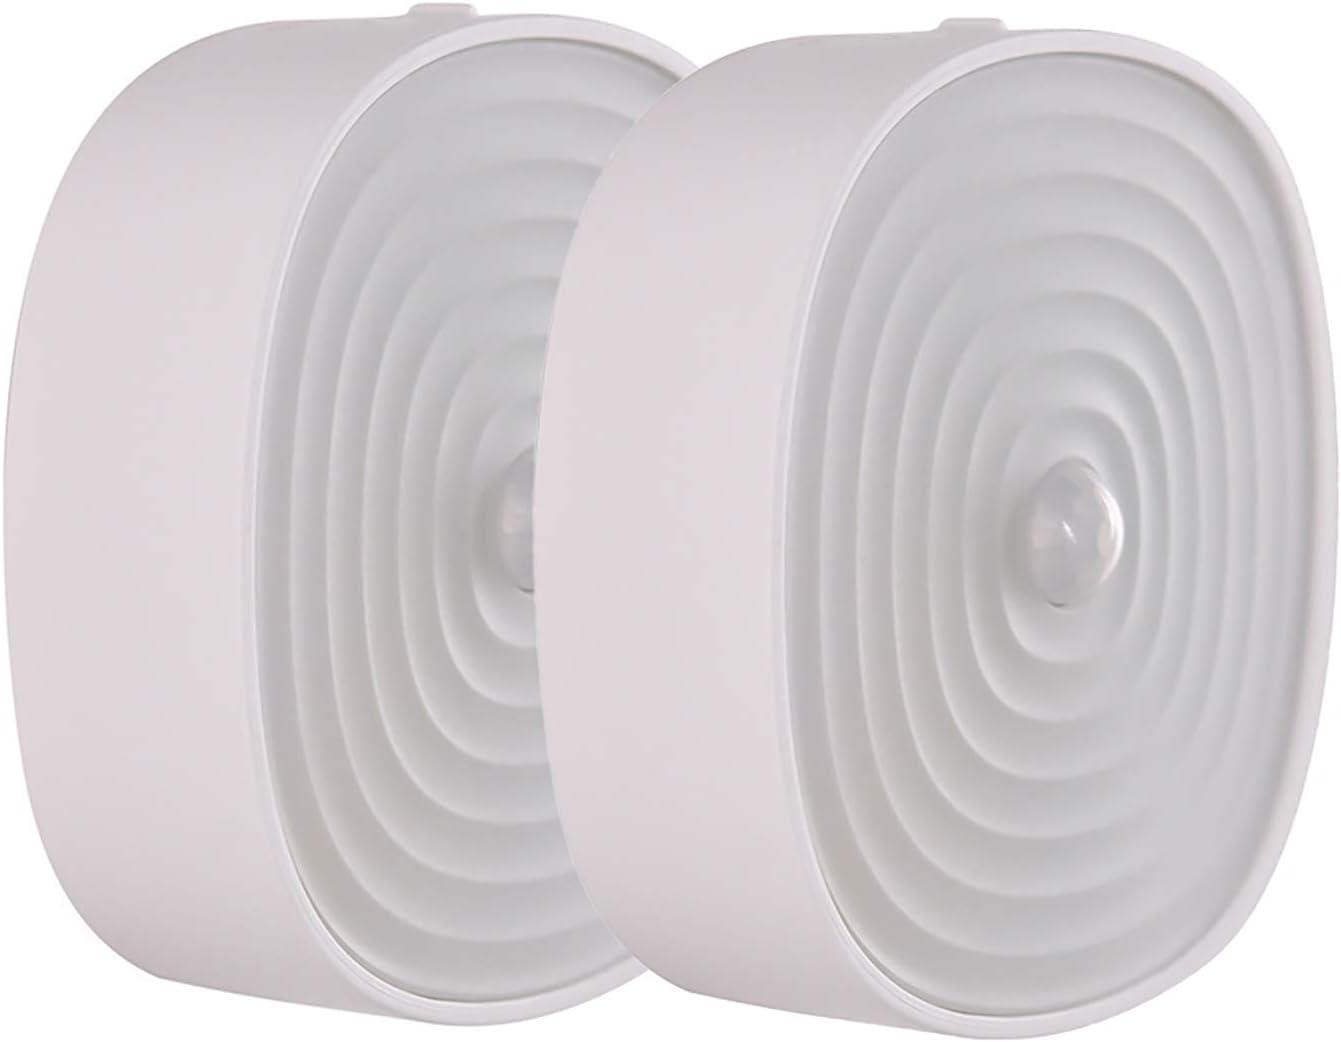 ZXCVASDF Sensor Light Closet Night Portable 8 LED Very popular Large special price !!